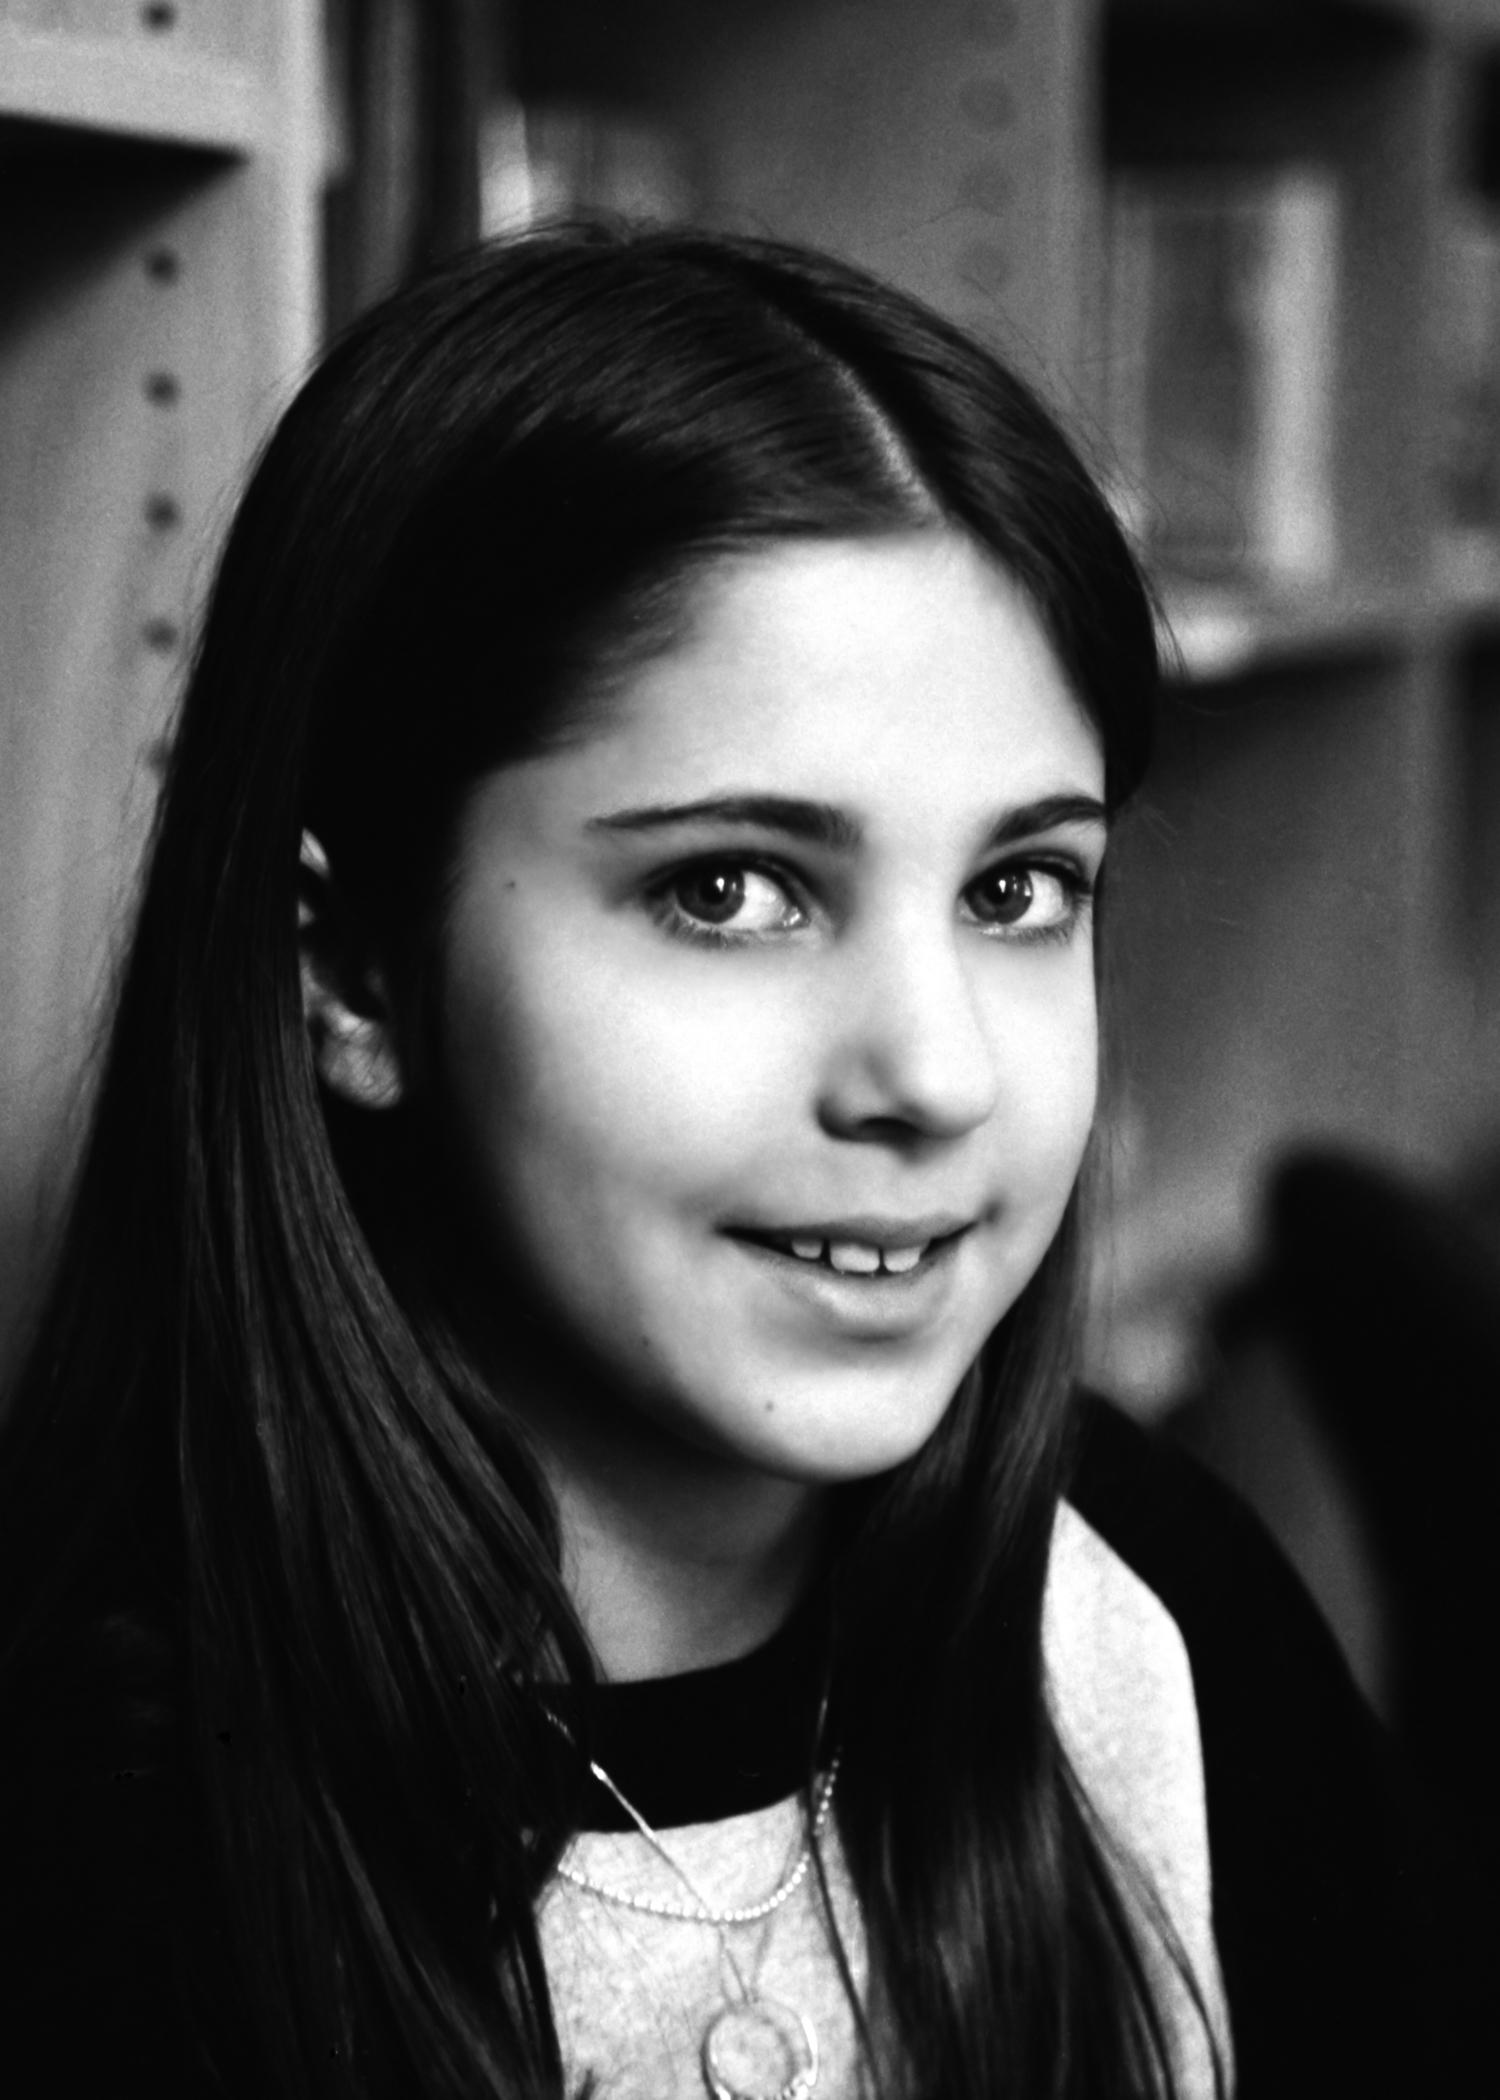 Amanda '03